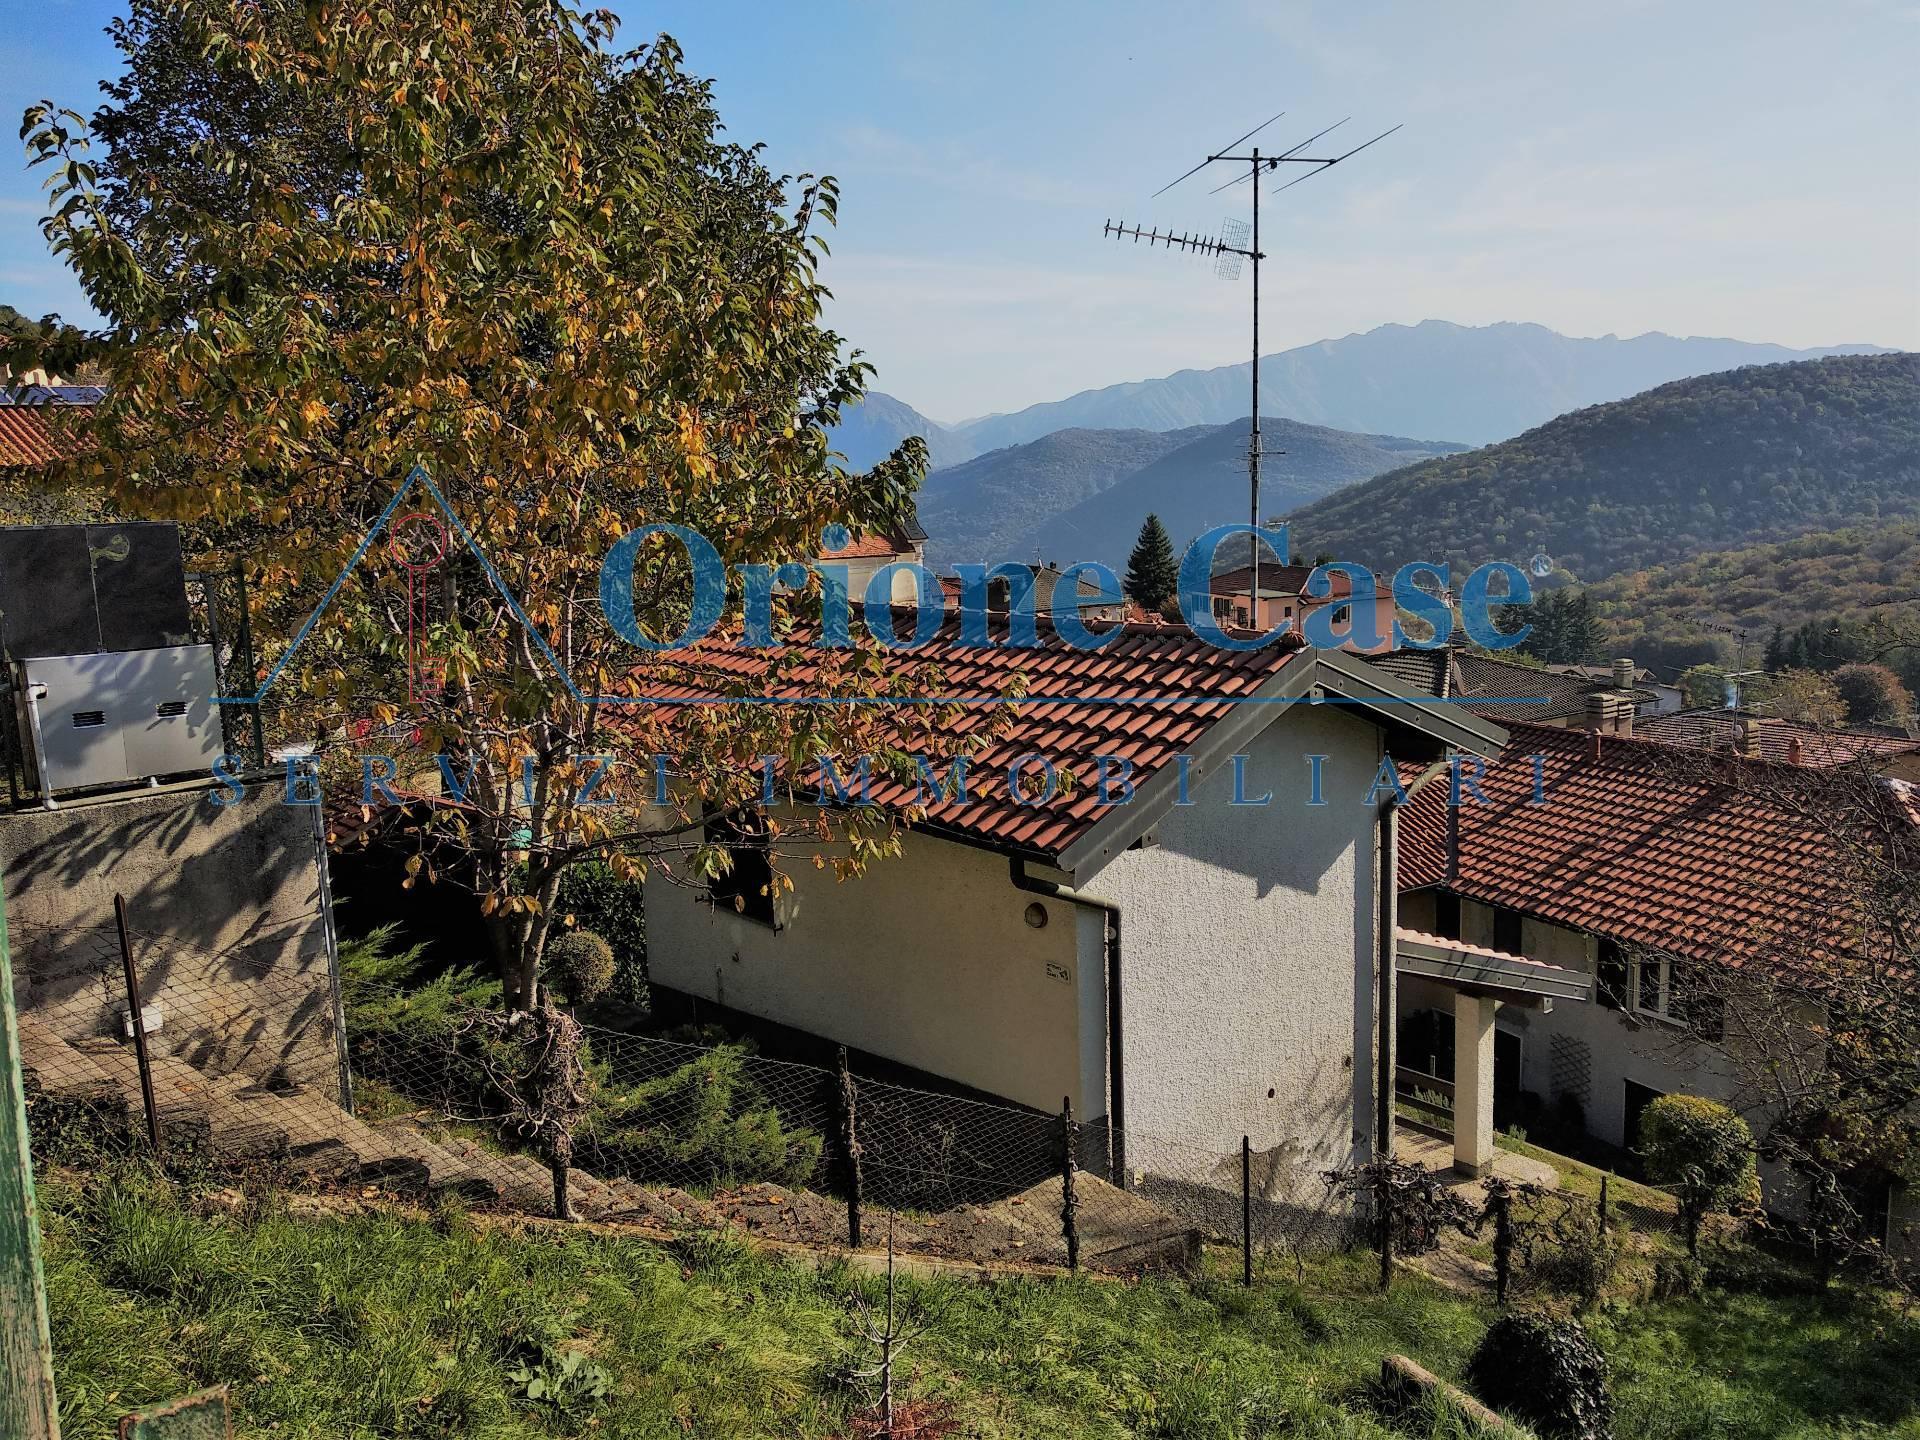 Vendita Casa Indipendente Casa/Villa Marzio 169497